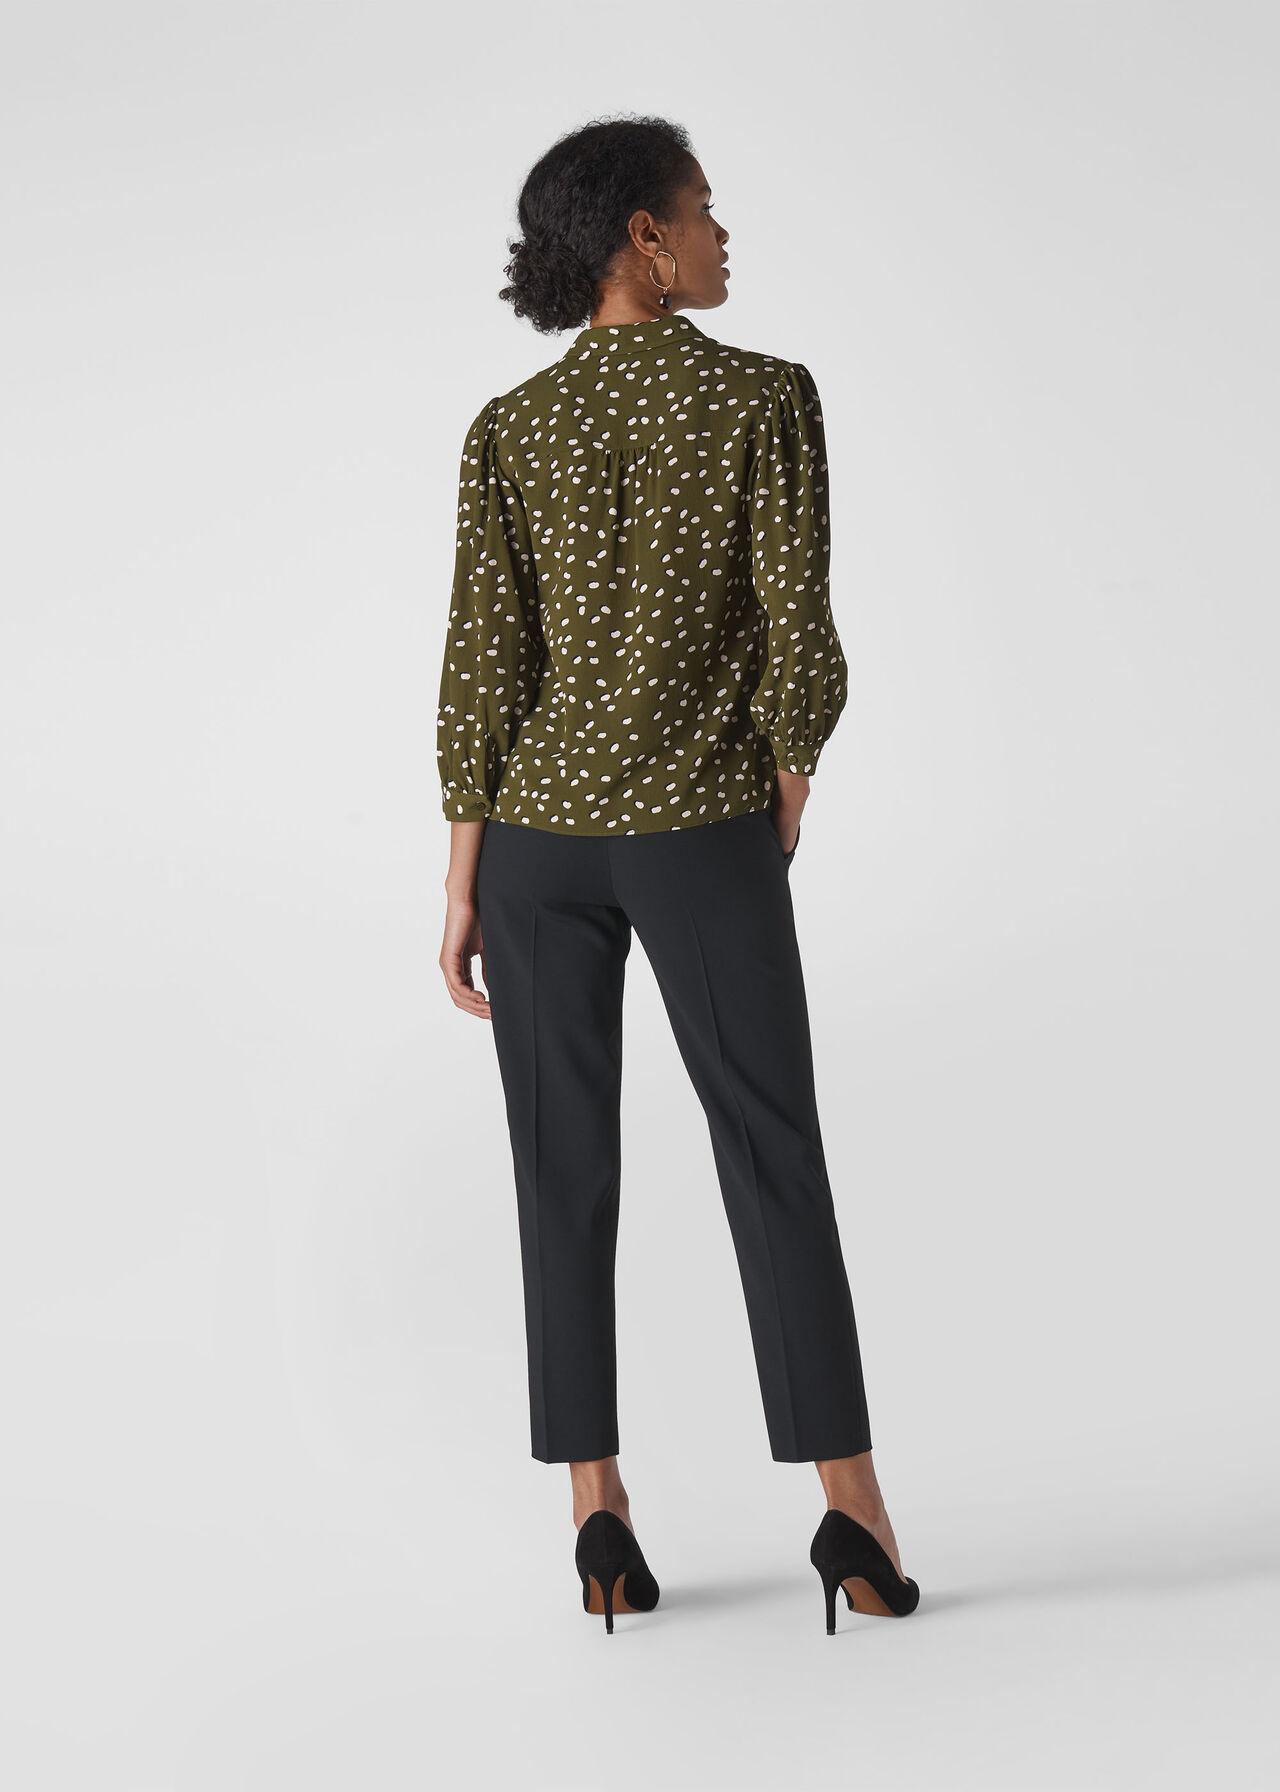 Shadow Spot Print Shirt Khaki/Multi